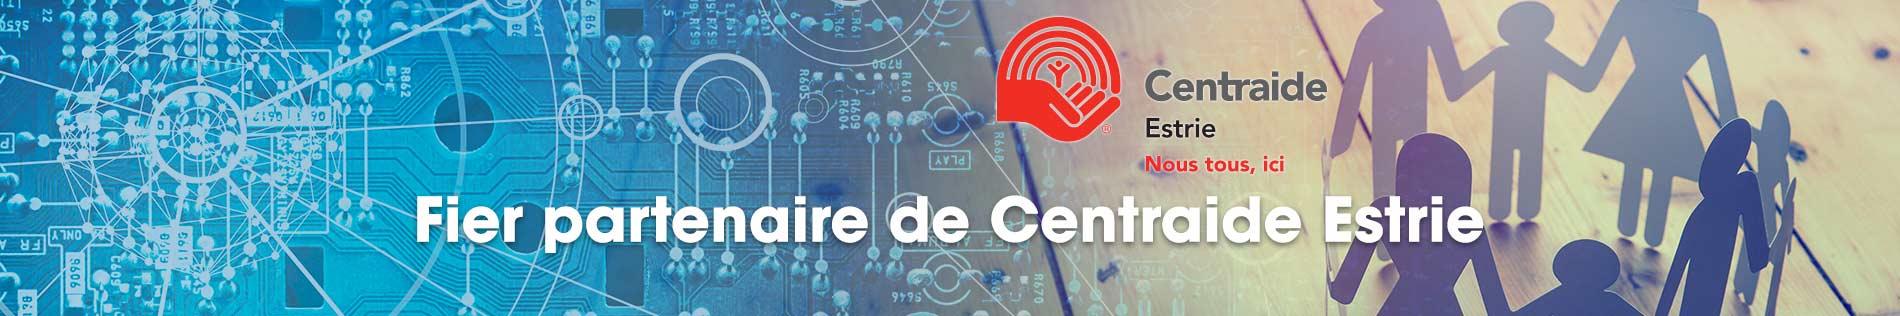 ClientWeb Centraide Estrie.jpg